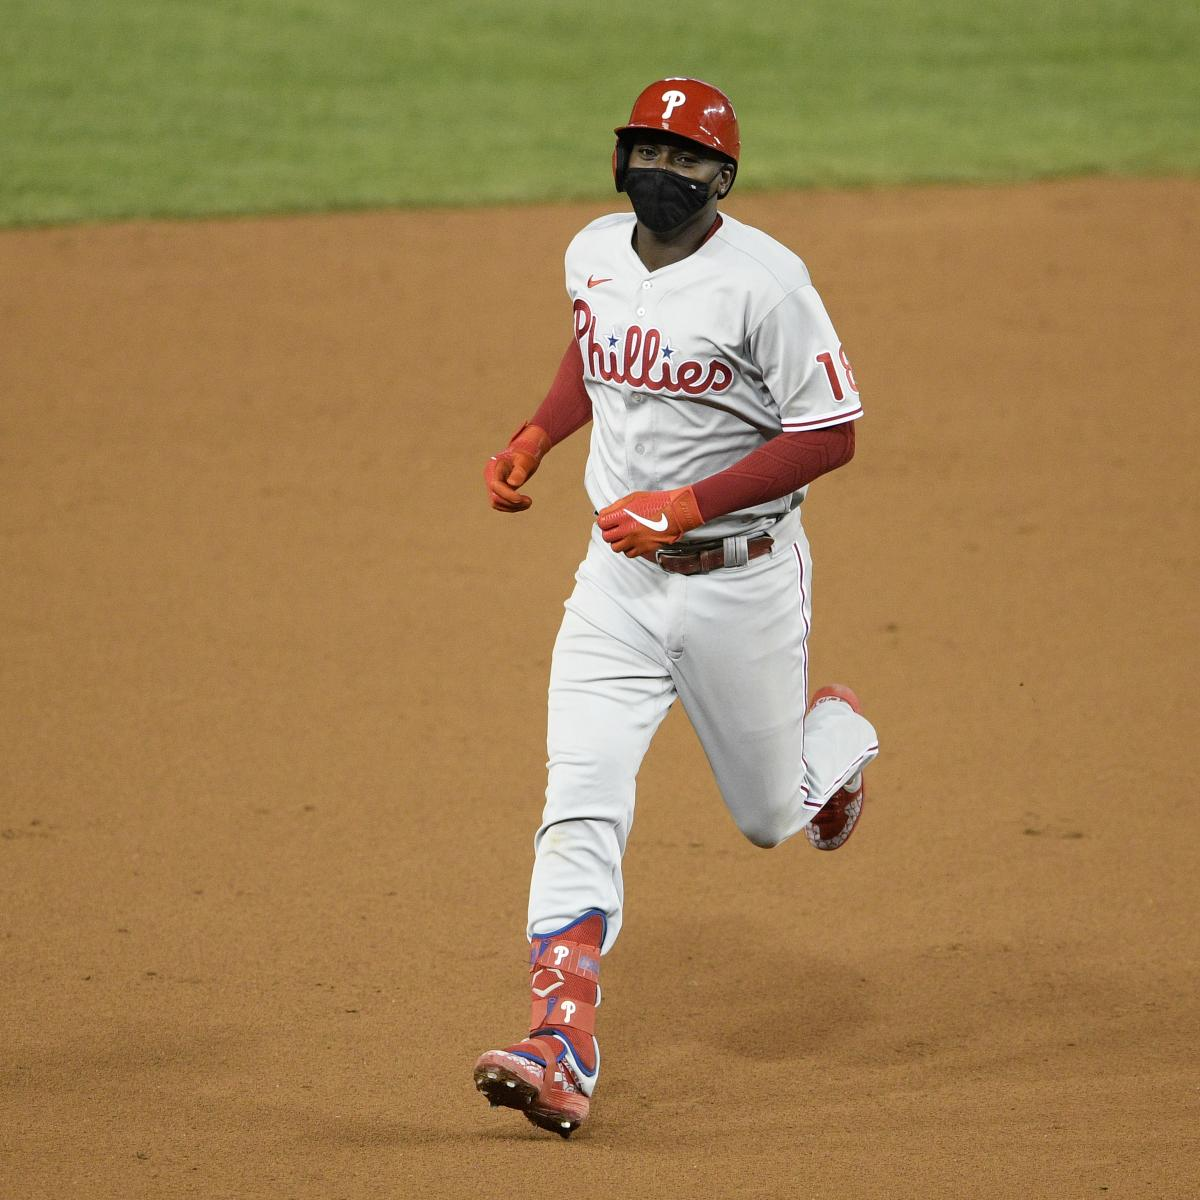 MLB Rumors: Didi Gregorius Drawing Interest from Angels Ahead of Free Agency